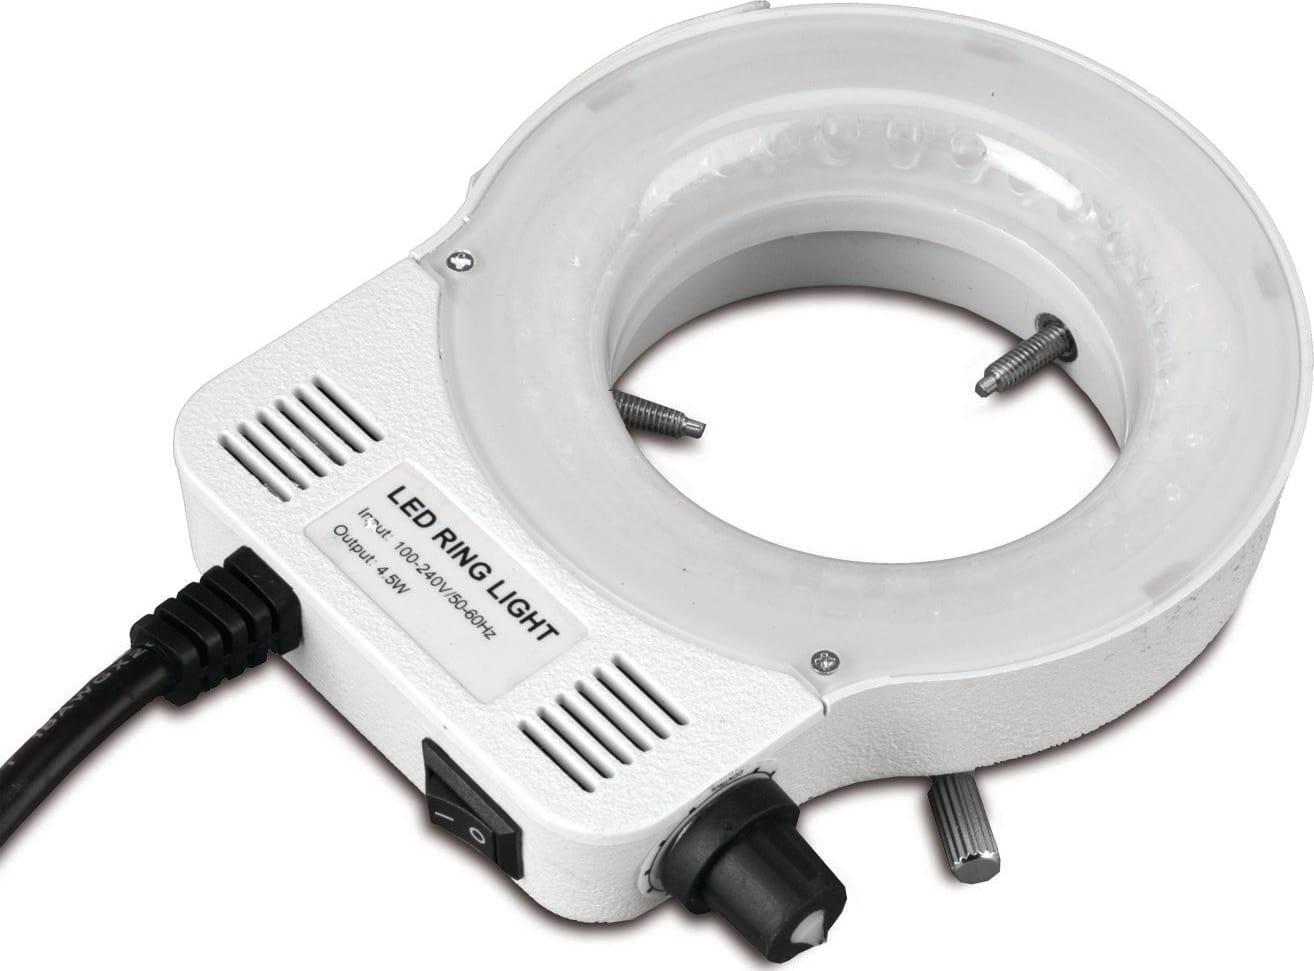 Scienscope Compact LED Ring Illuminator